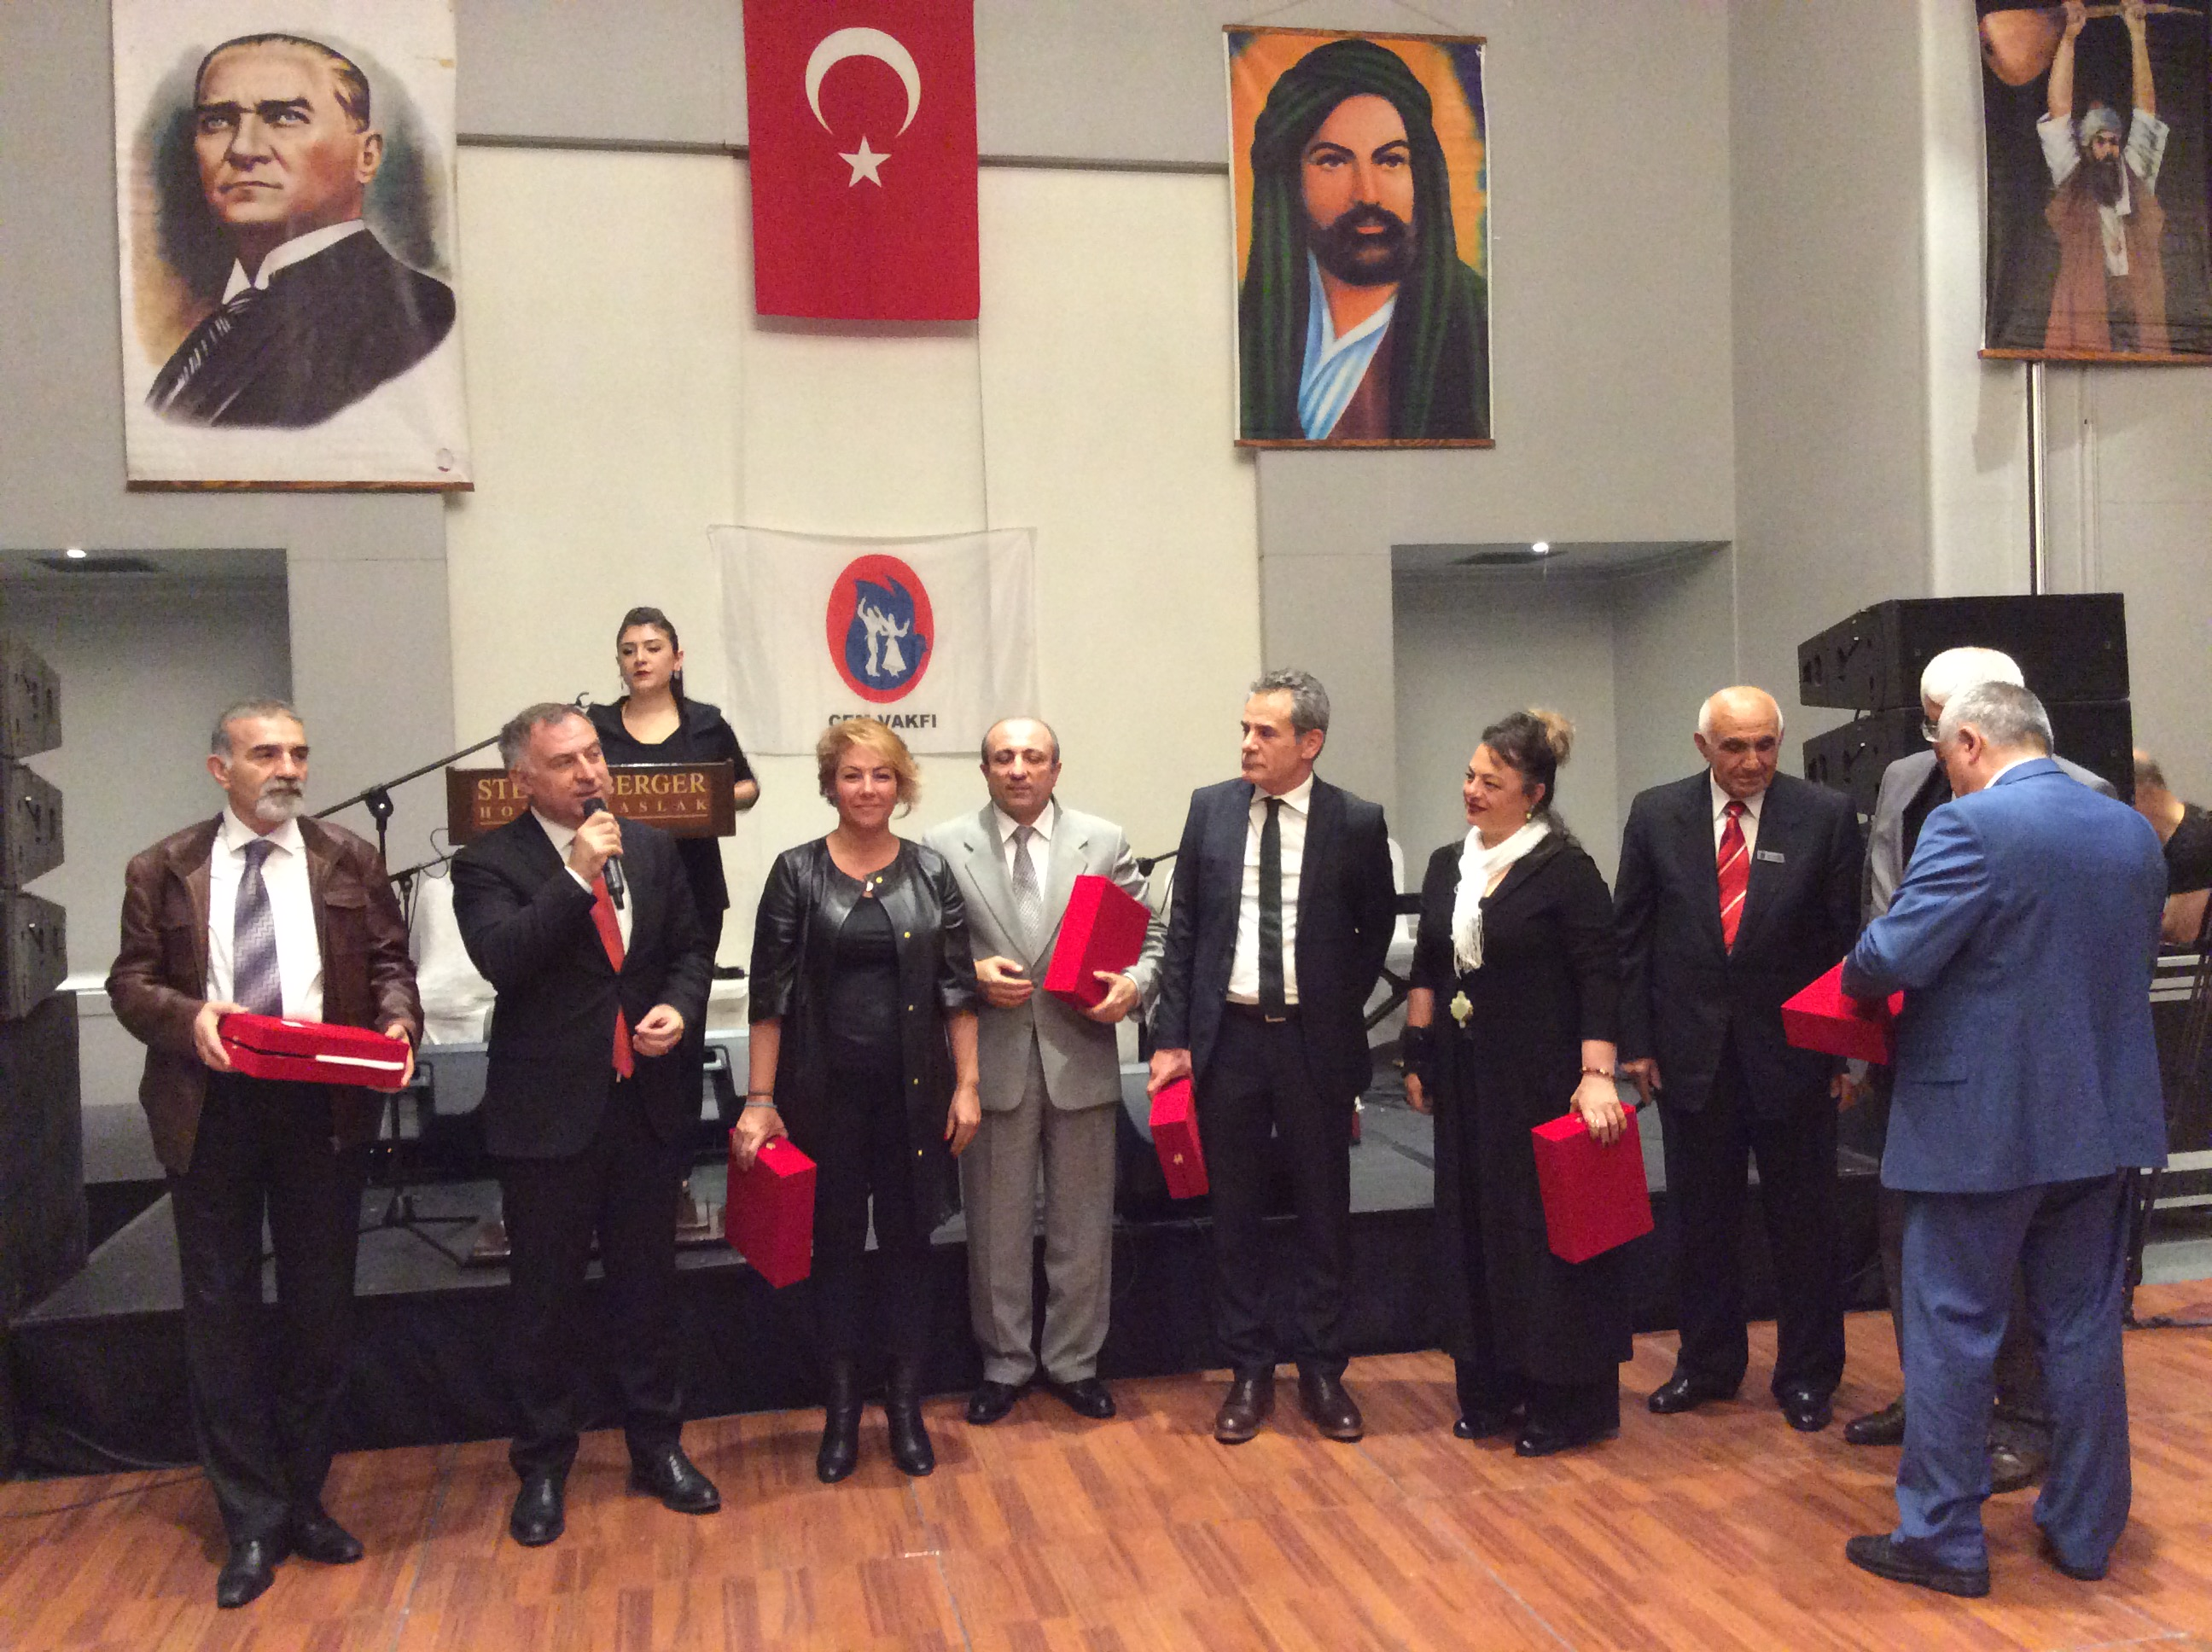 Gokanzeybek